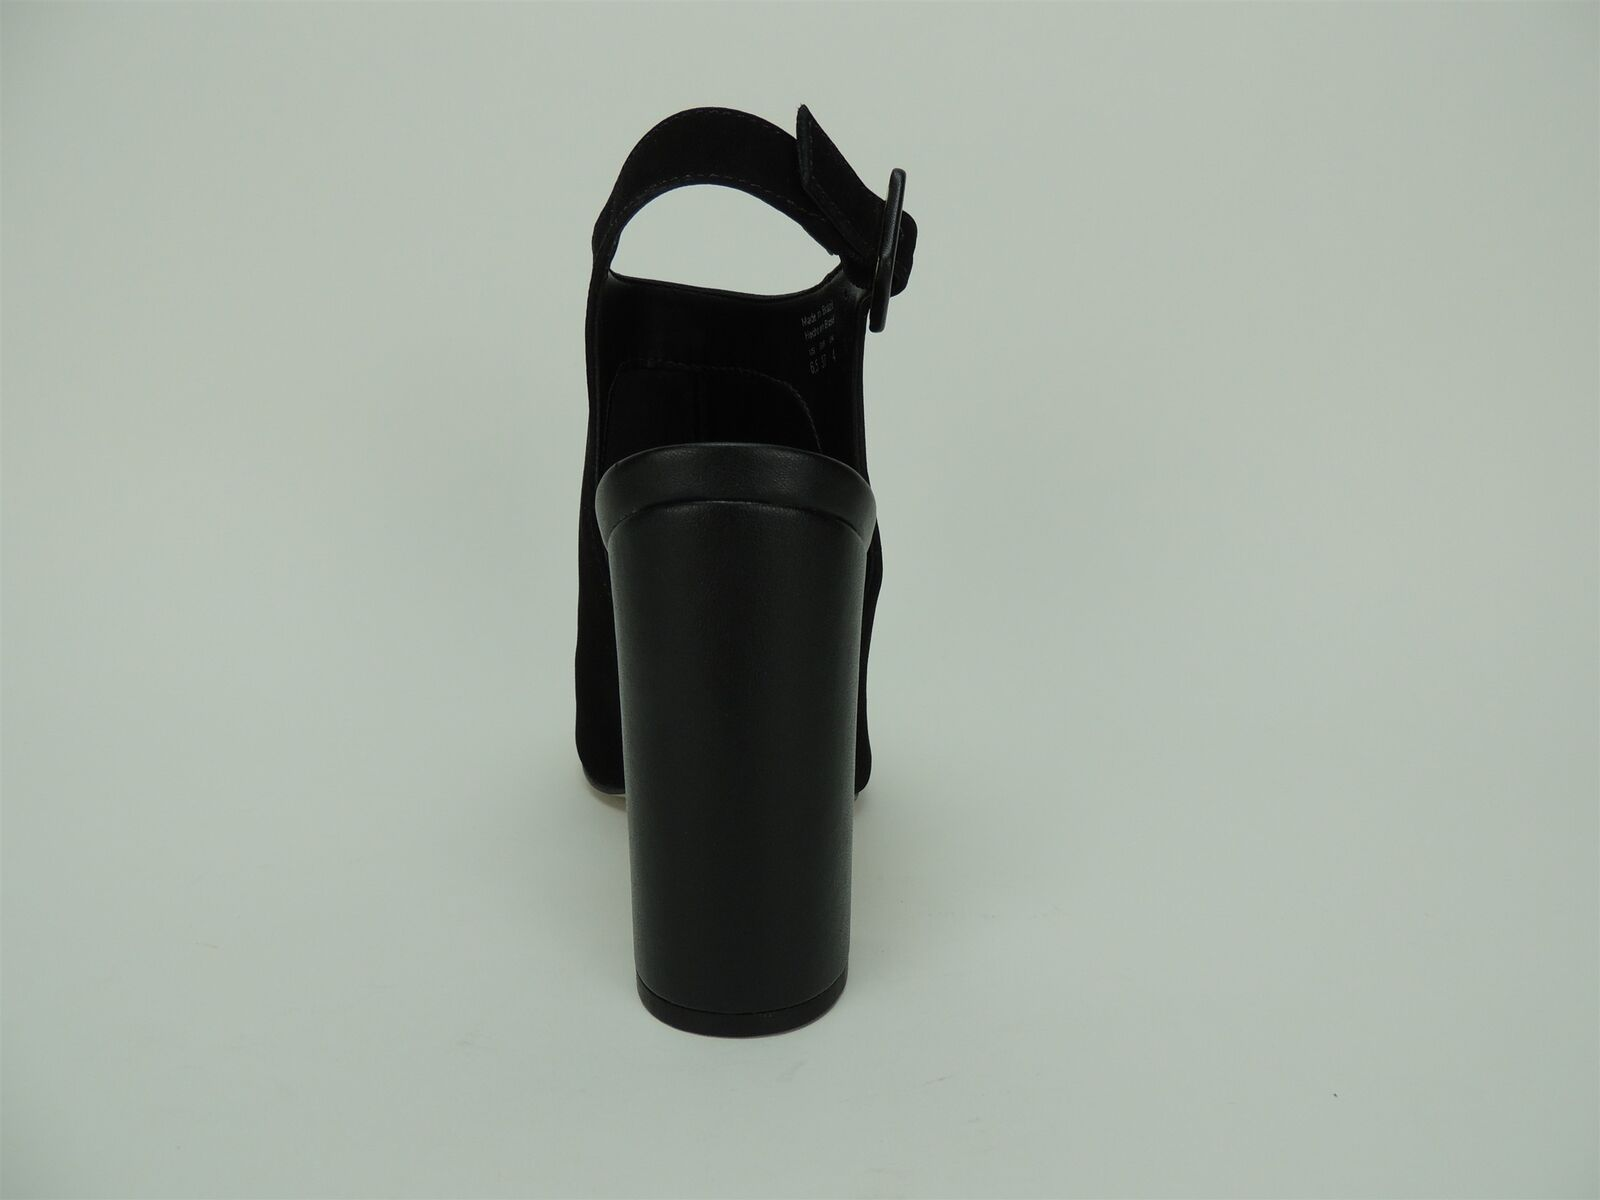 ALDO Women's Juliusa Slingback Mule Mule Mule Black Nubuck Size 6.5 M 9014d4